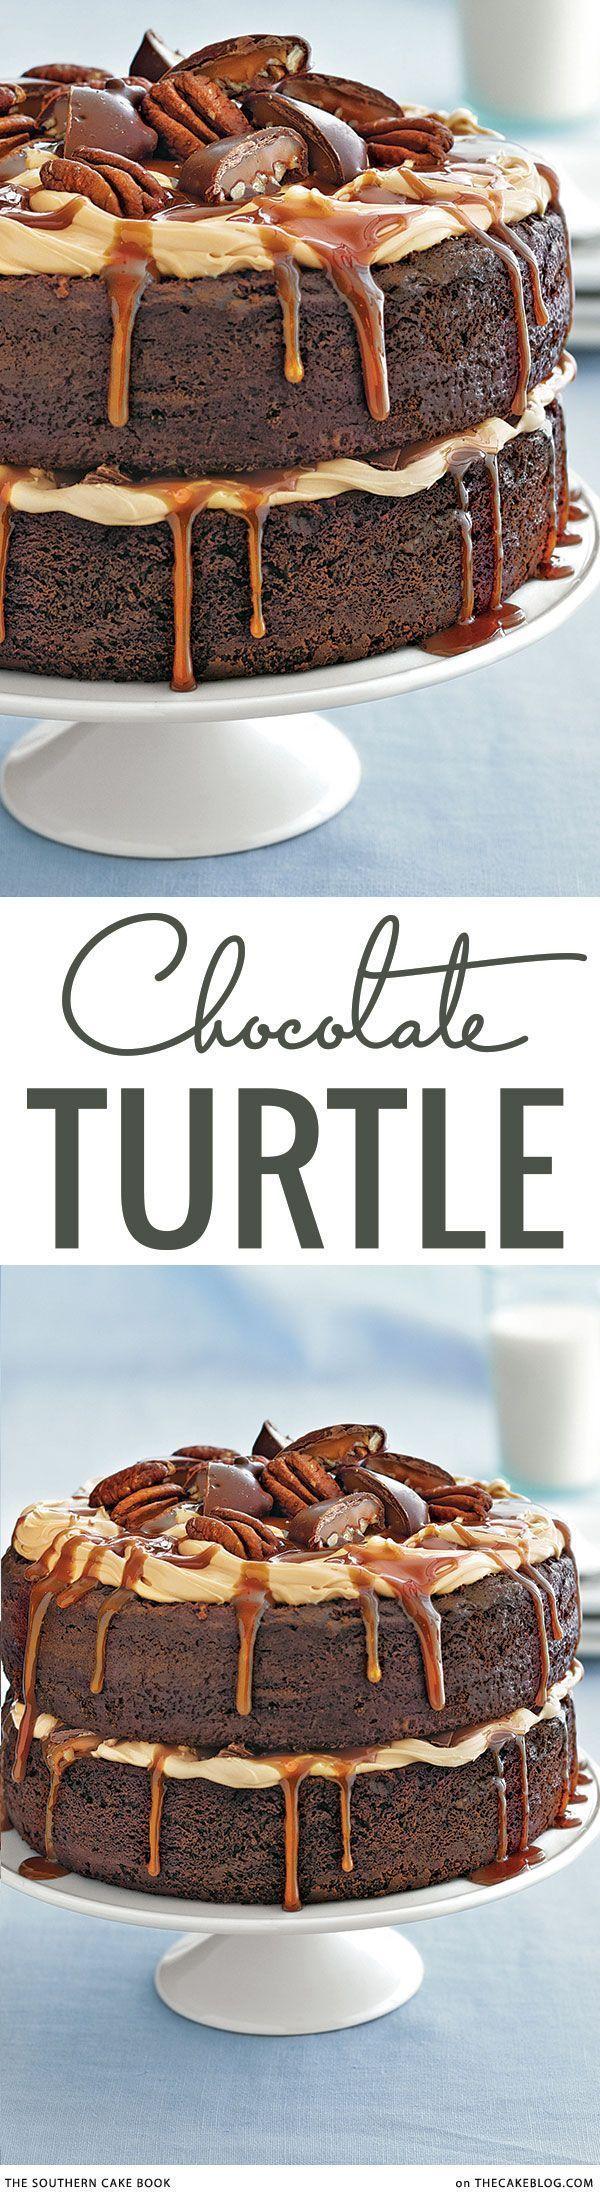 Chocolate, caramel and pecan heaven! Chocolate Turtle Cake Recipe | The Southern Cake Book on TheCakeBlog.com